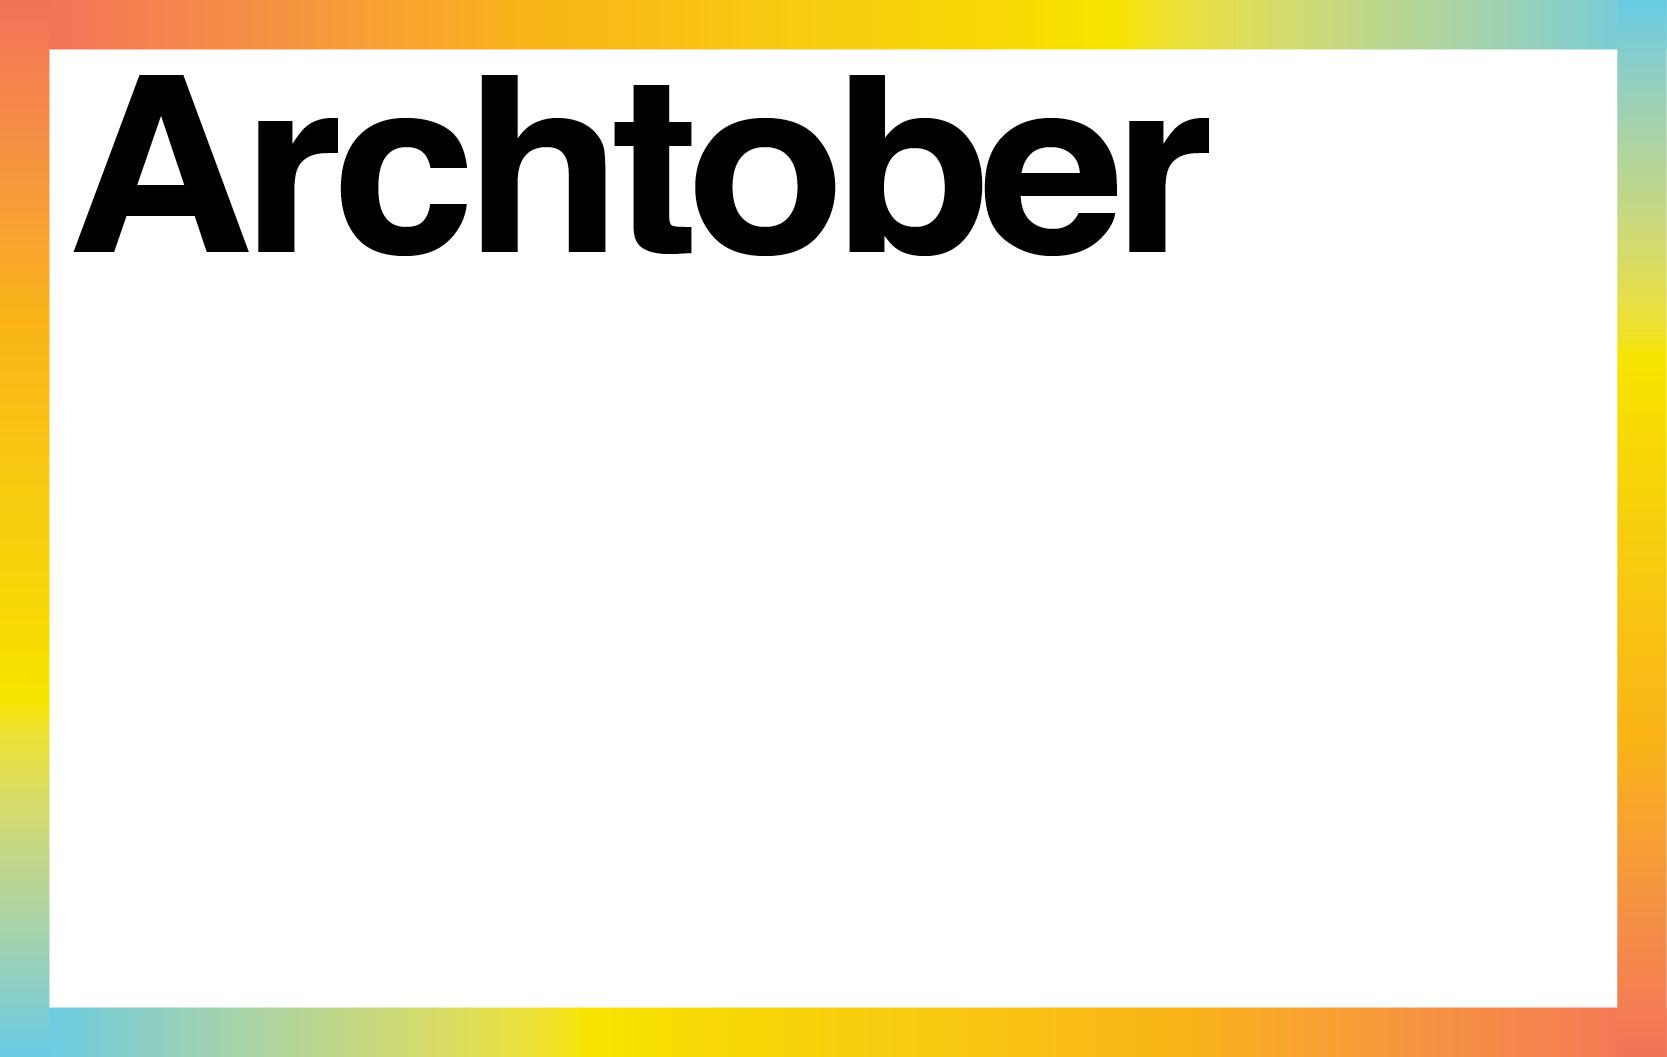 Archtober_Logo_Gradient.jpg